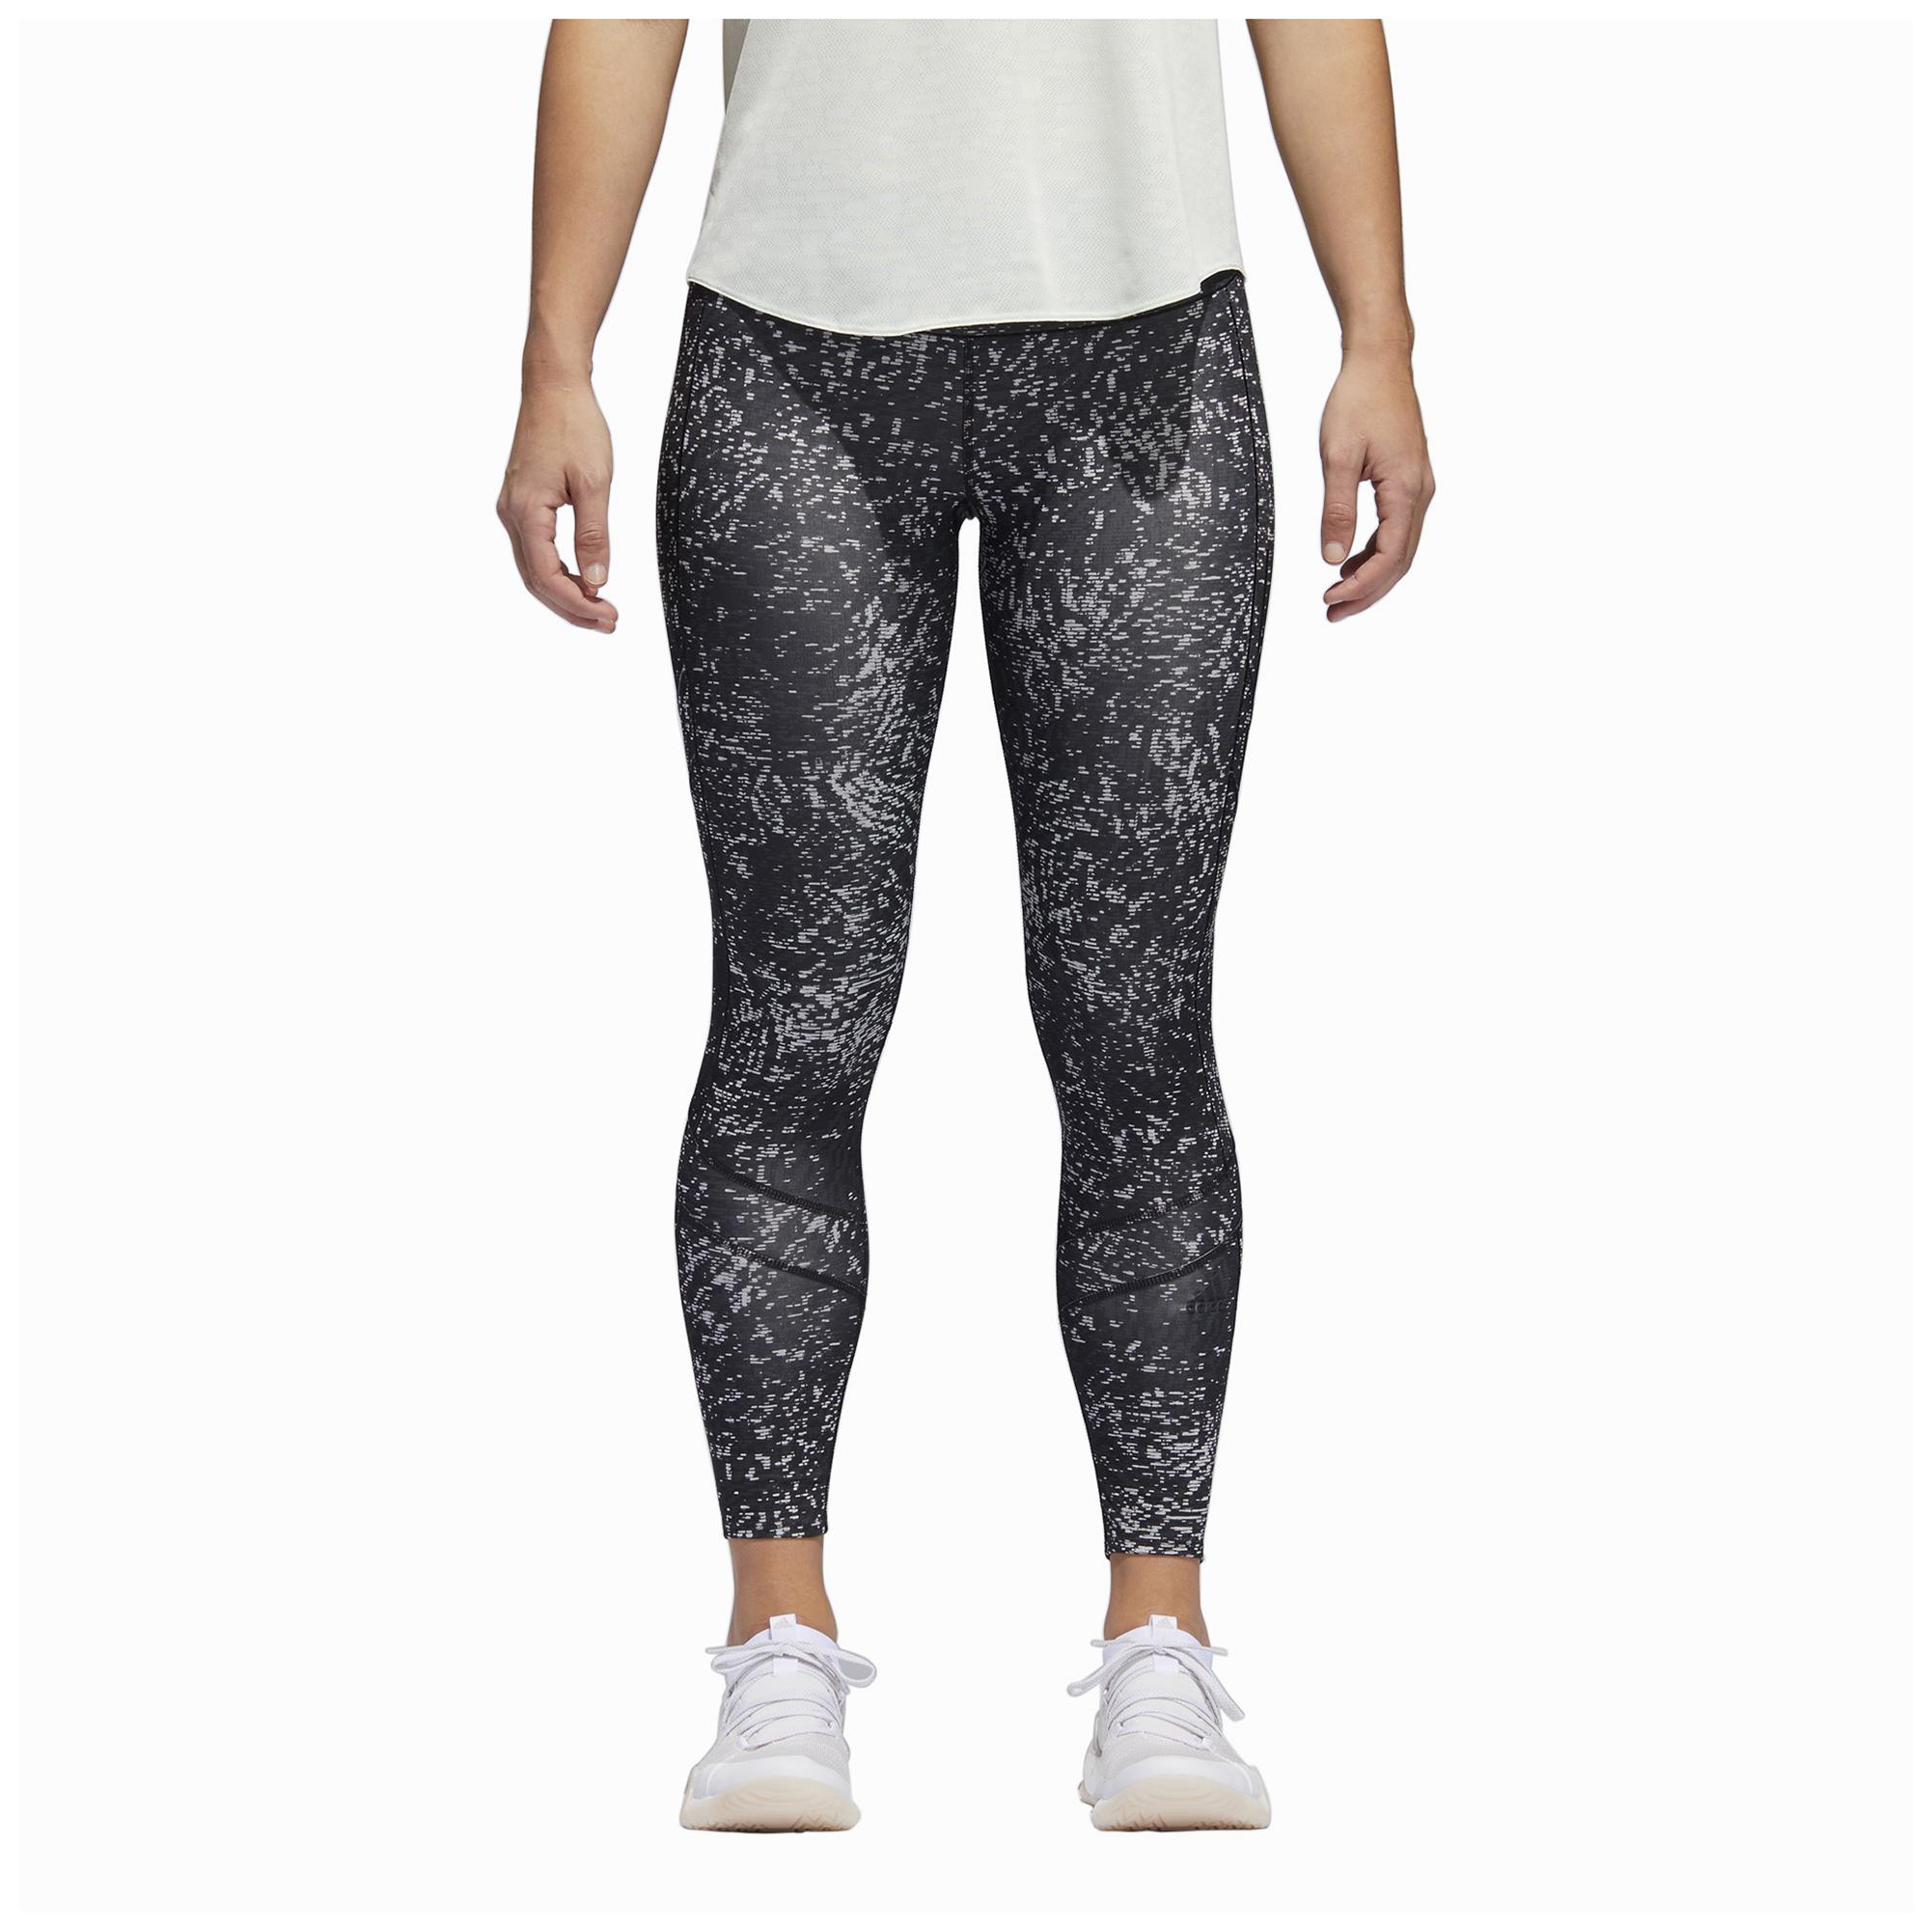 Design adidas Response Running Tights Sportswear for Women Shop Womens Sportswear COLOUR-black